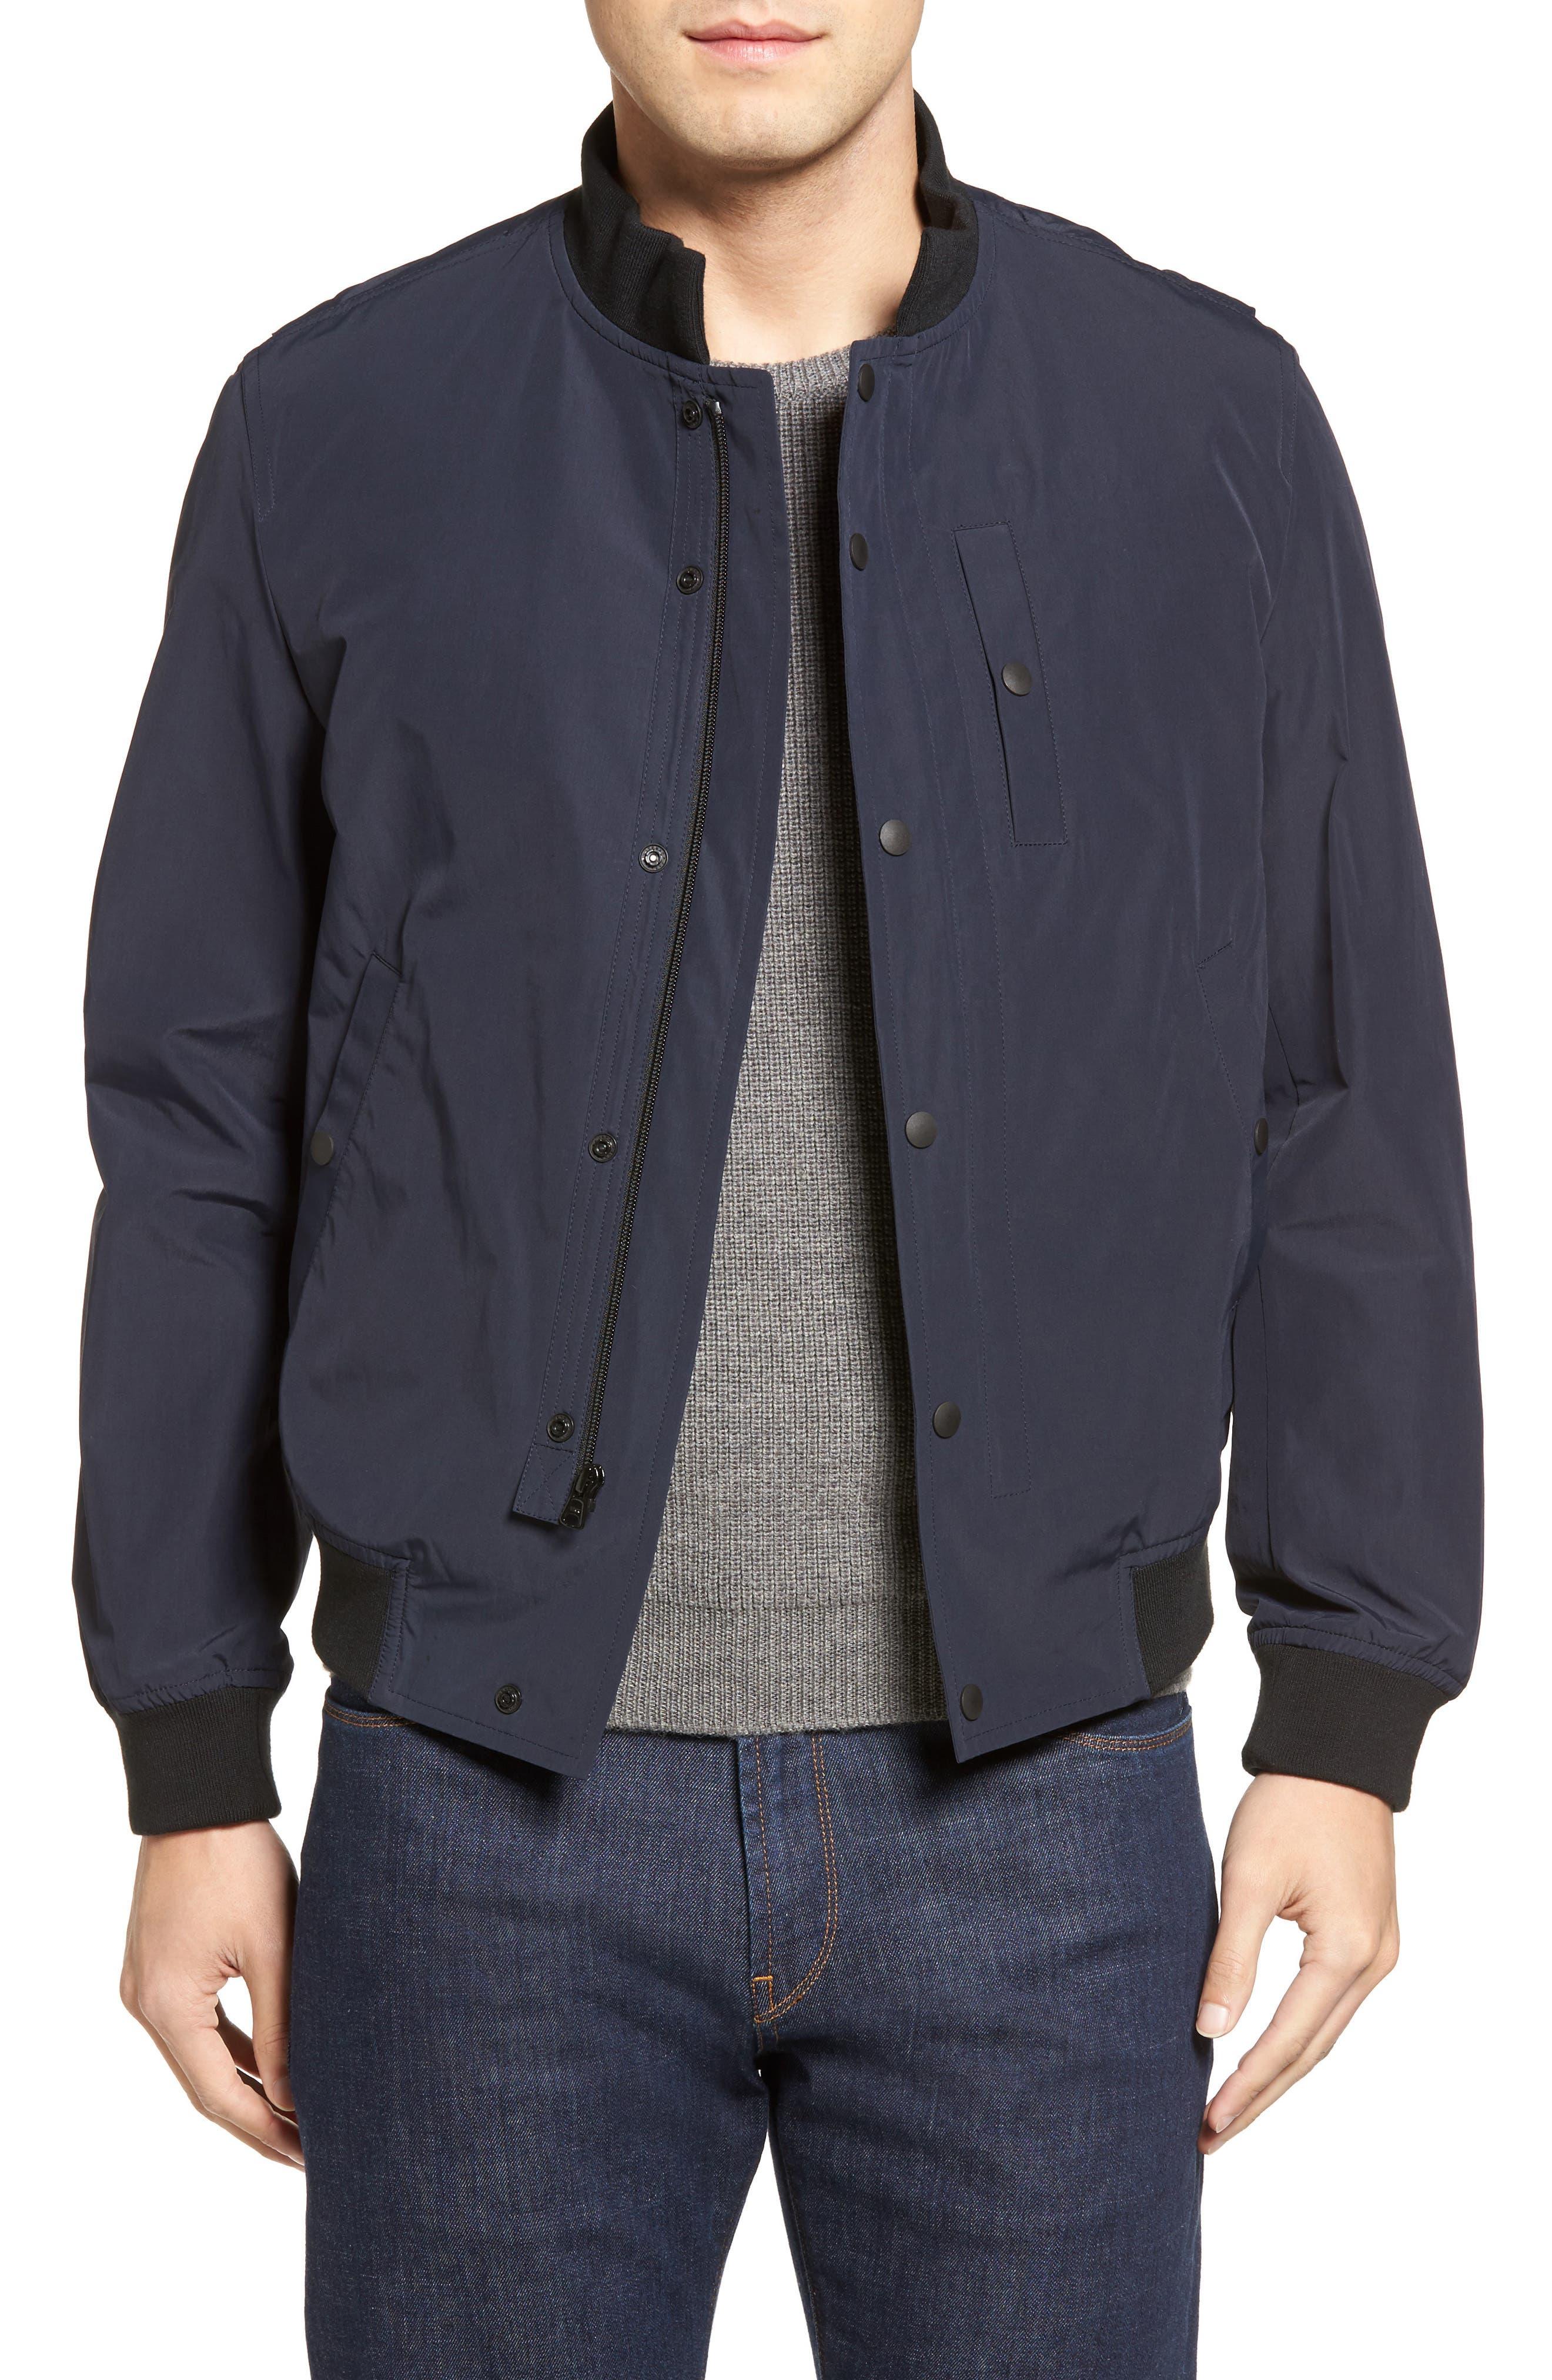 Alternate Image 1 Selected - Sanyo Water Repellent Jacket